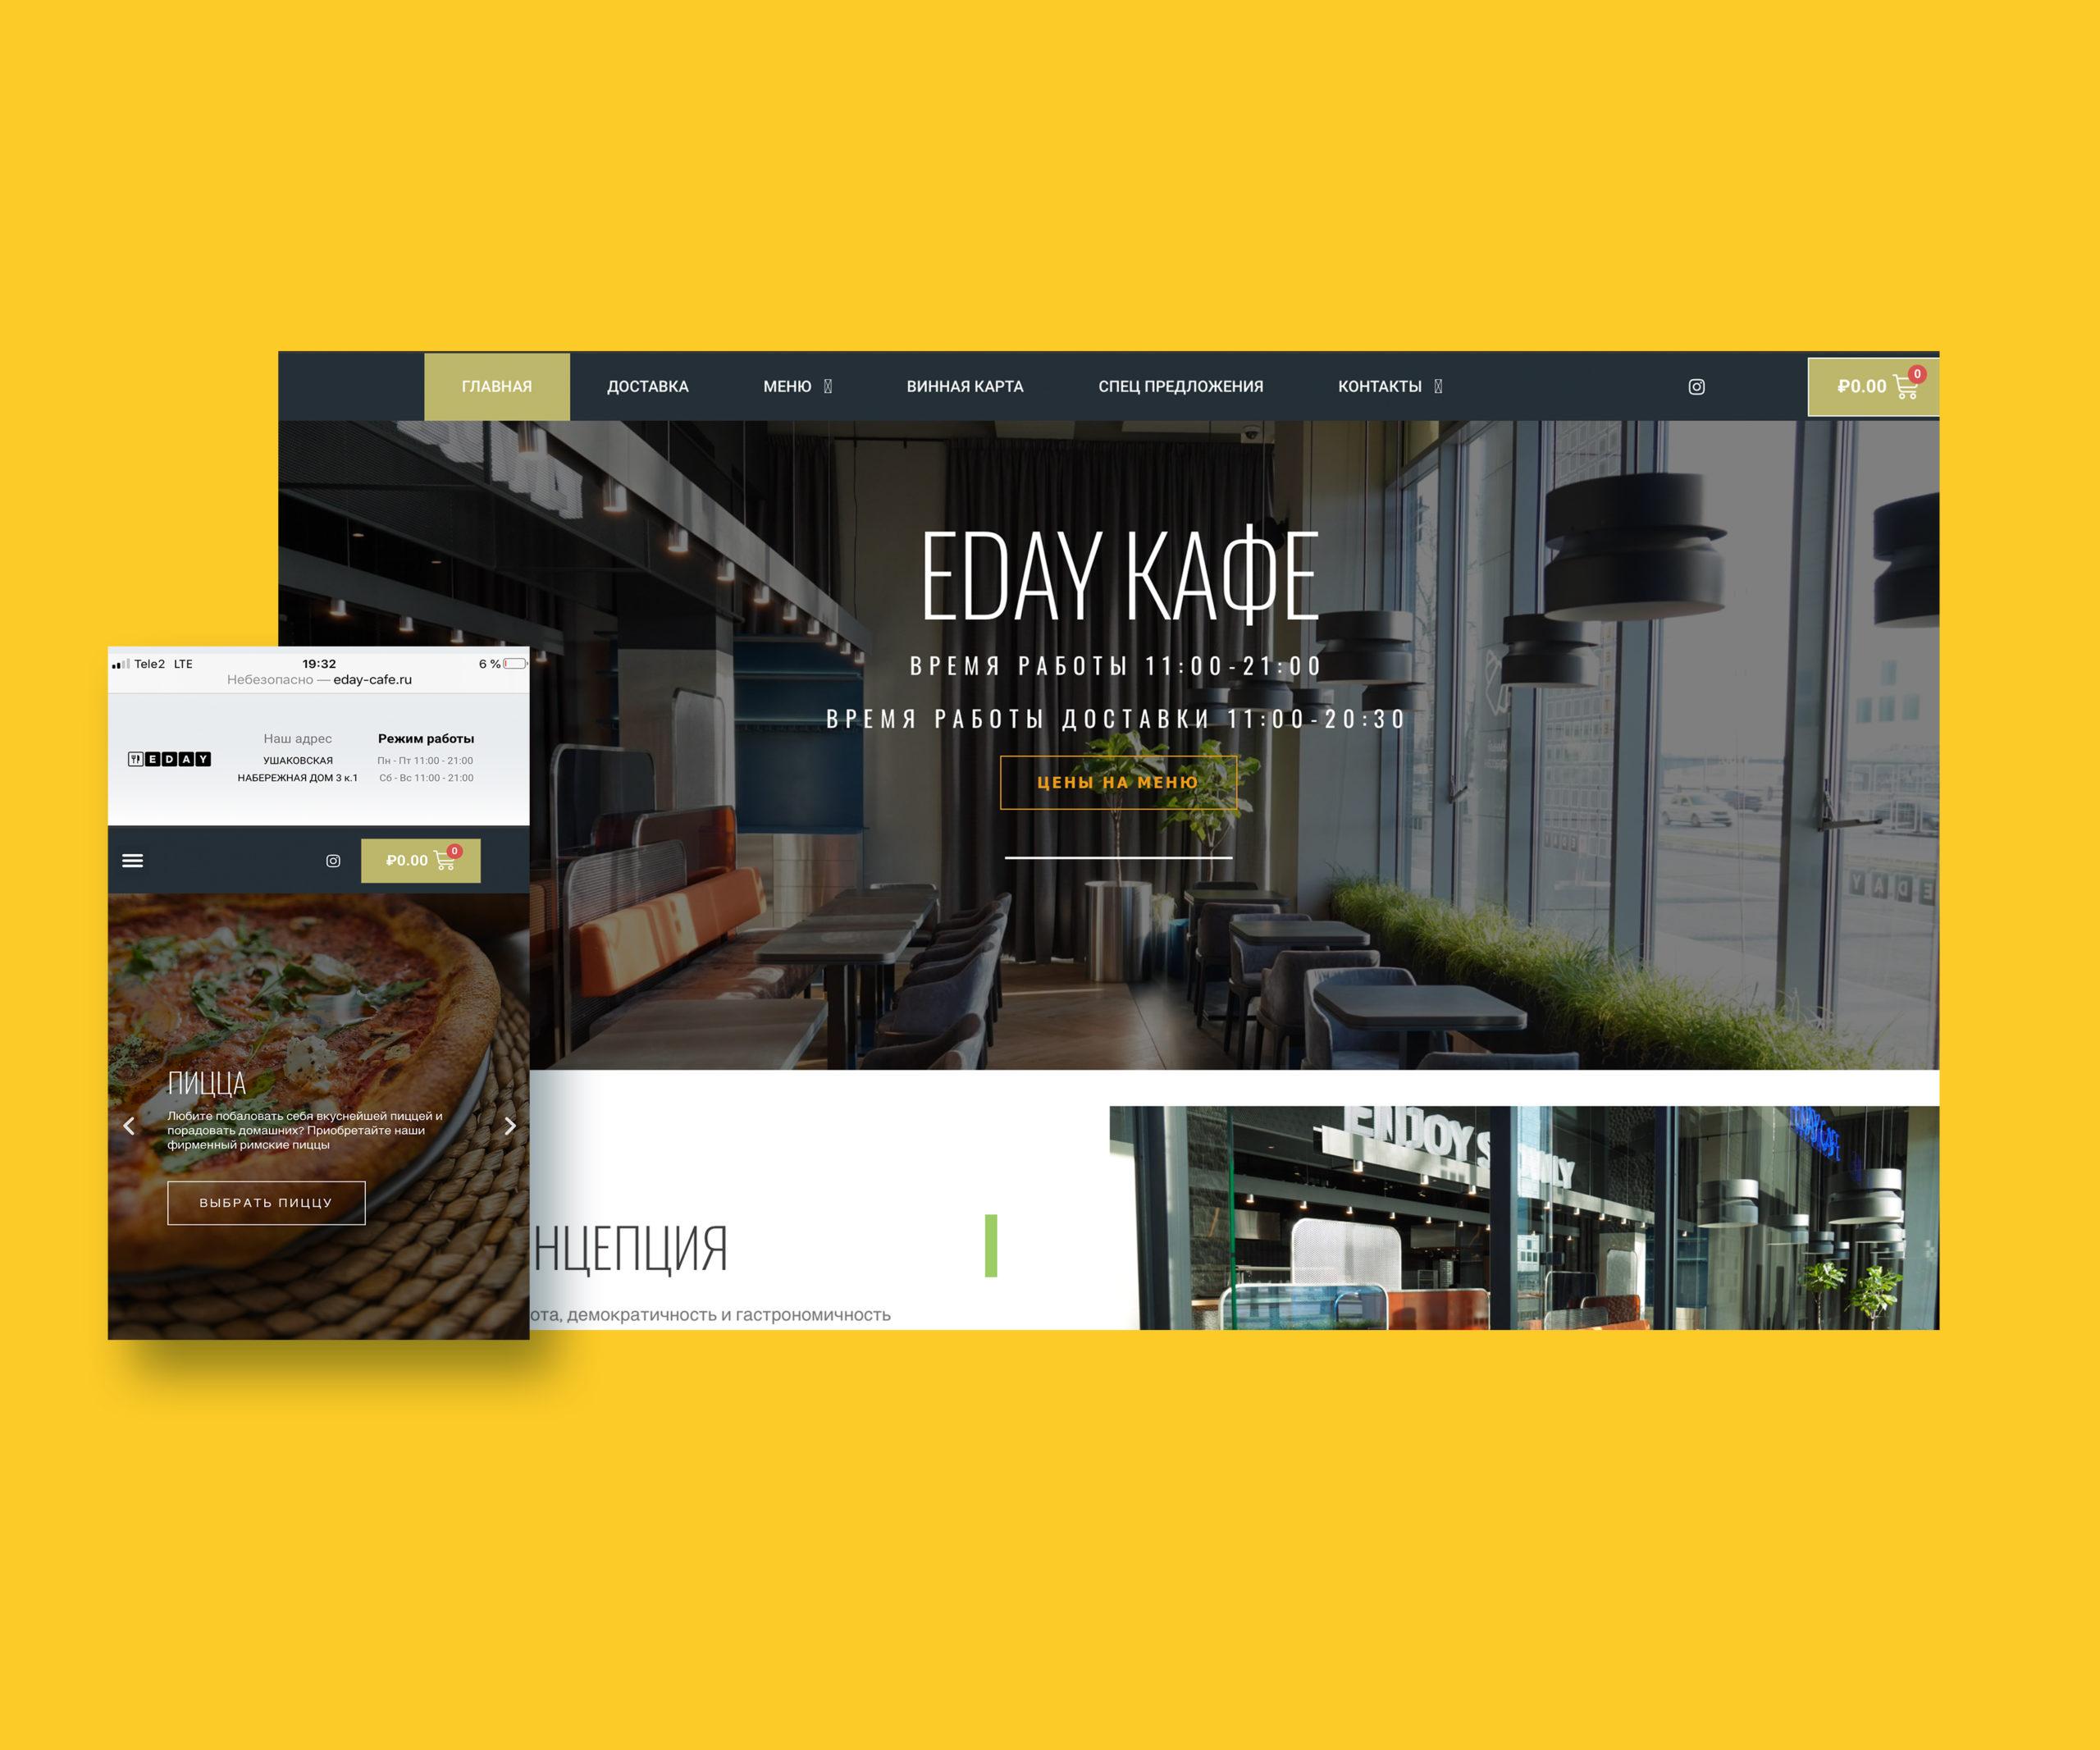 EDAY-CAFE